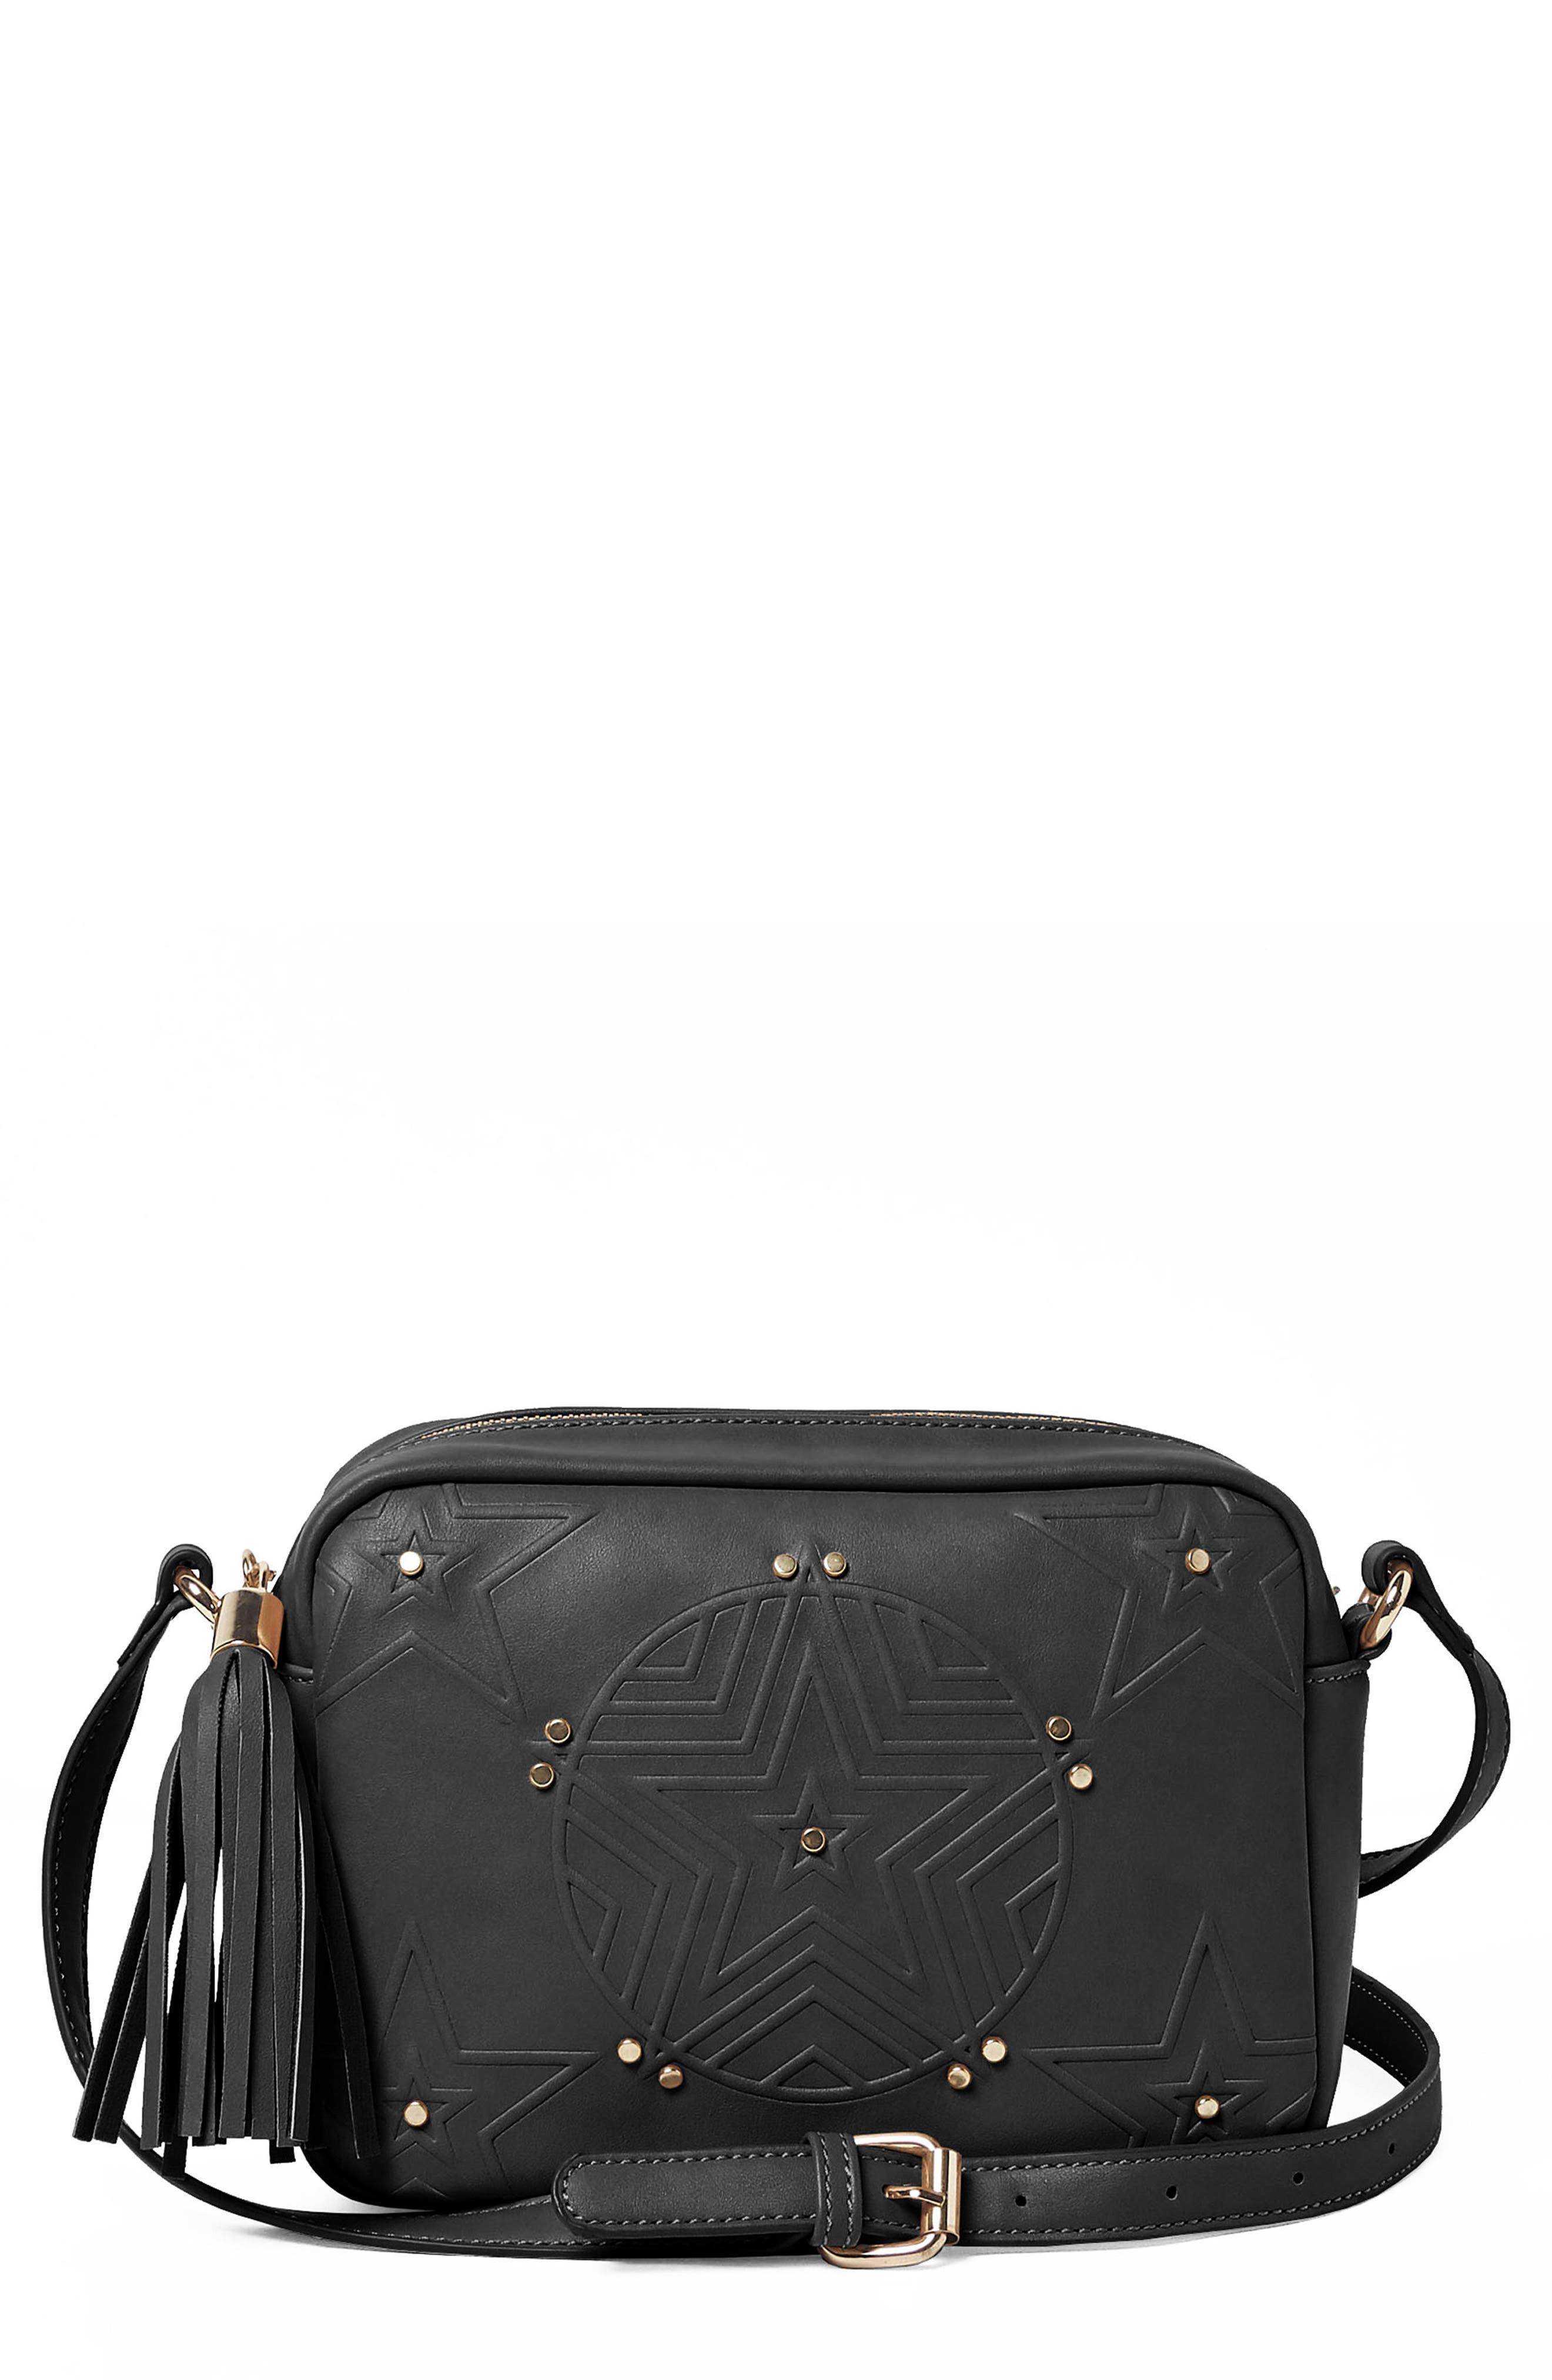 Stargazer Vegan Leather Crossbody Bag,                             Main thumbnail 1, color,